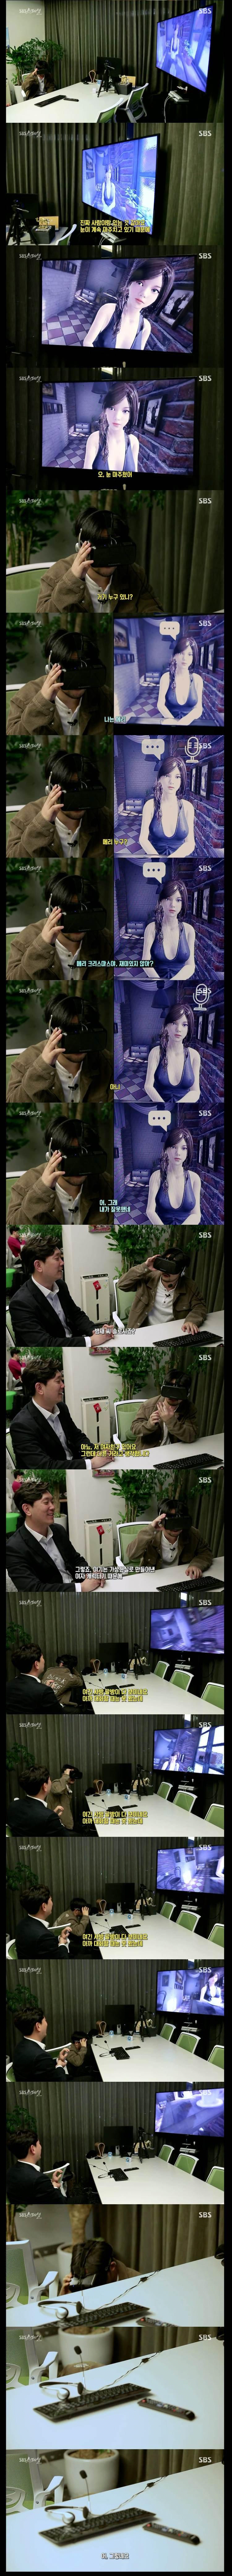 VR을 접한 유병재